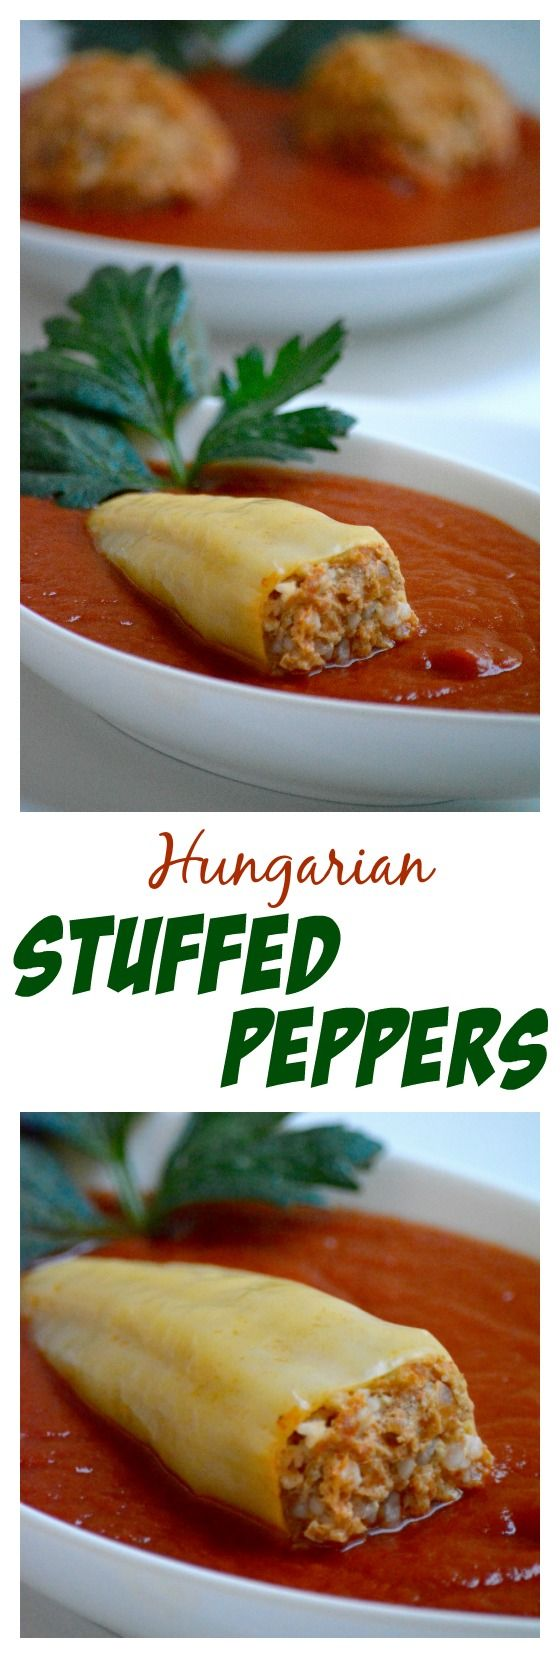 Hungarian stuffed peppers in tomato sauce, Töltött paprika